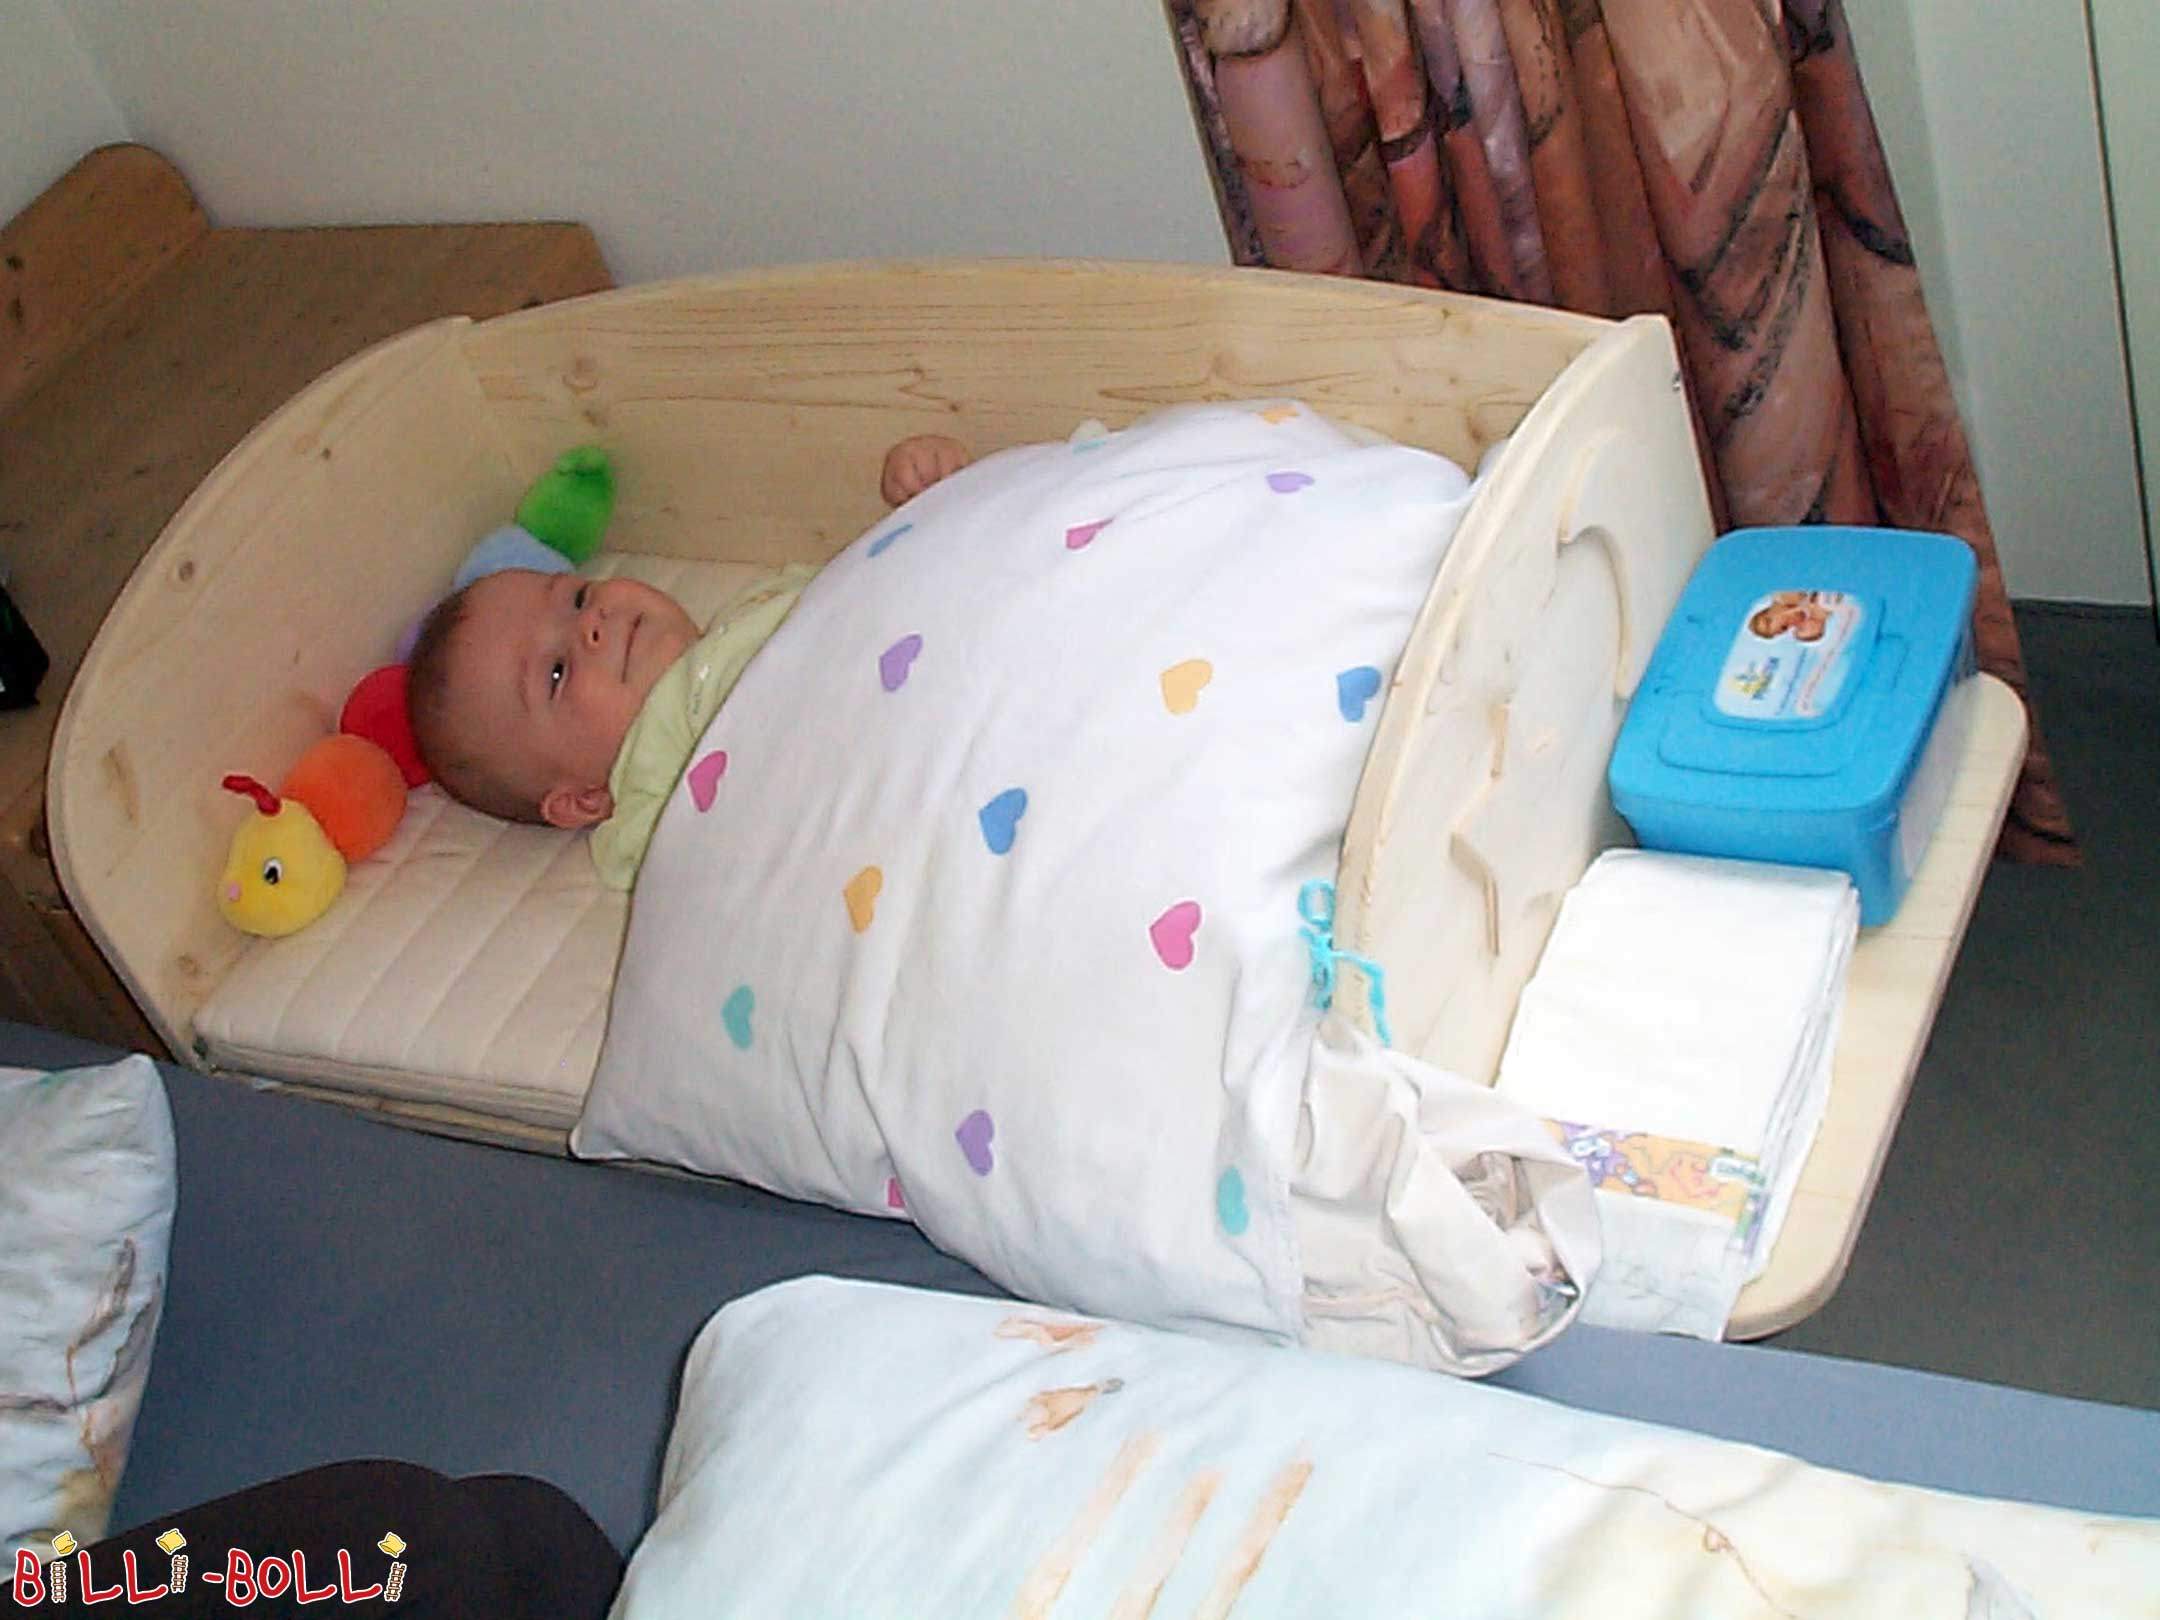 Cuna adosada | Muebles infantiles de Billi-Bolli